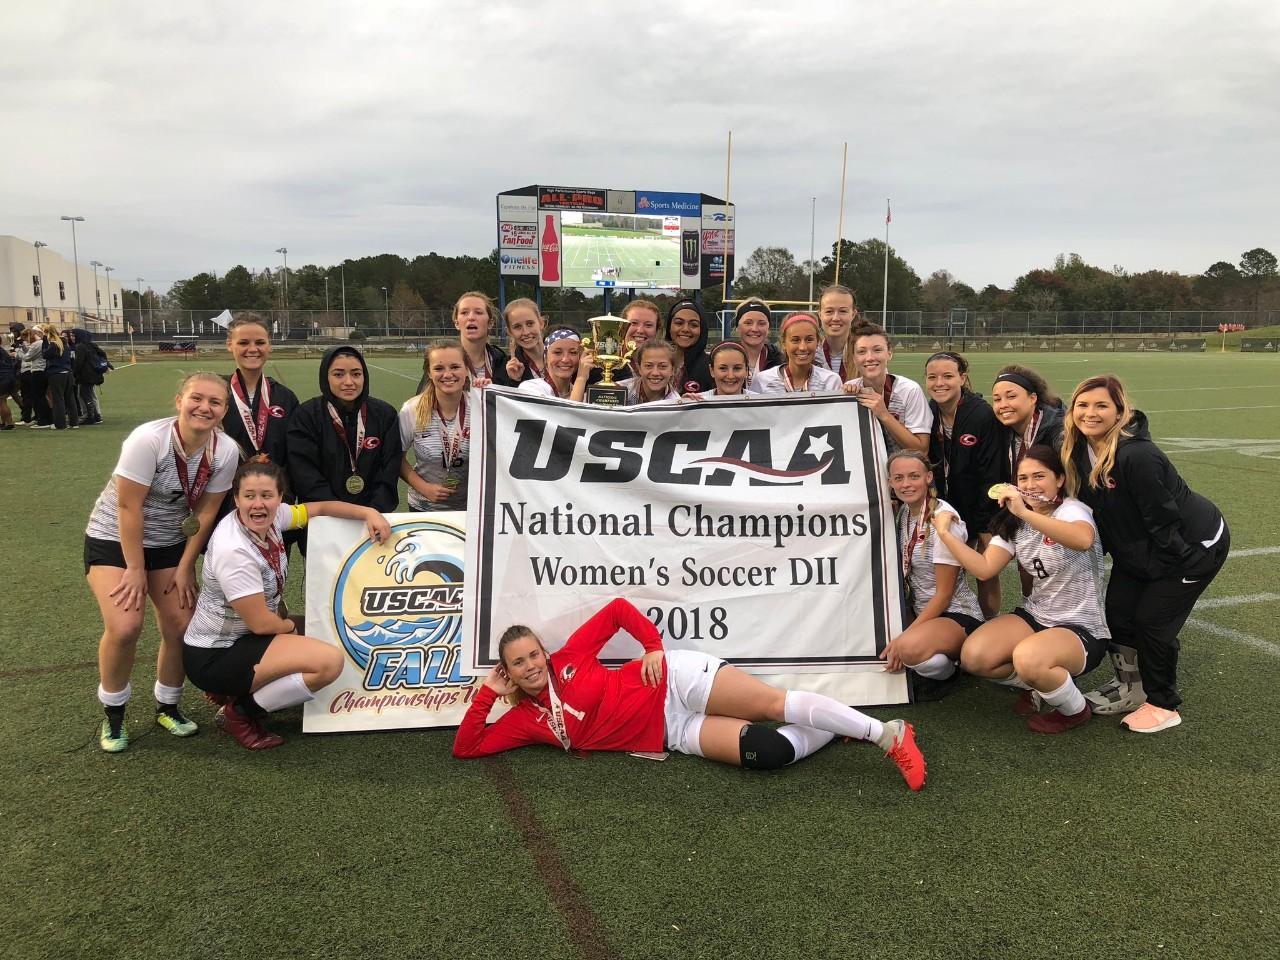 2018 women's soccer team celebrates national championship win